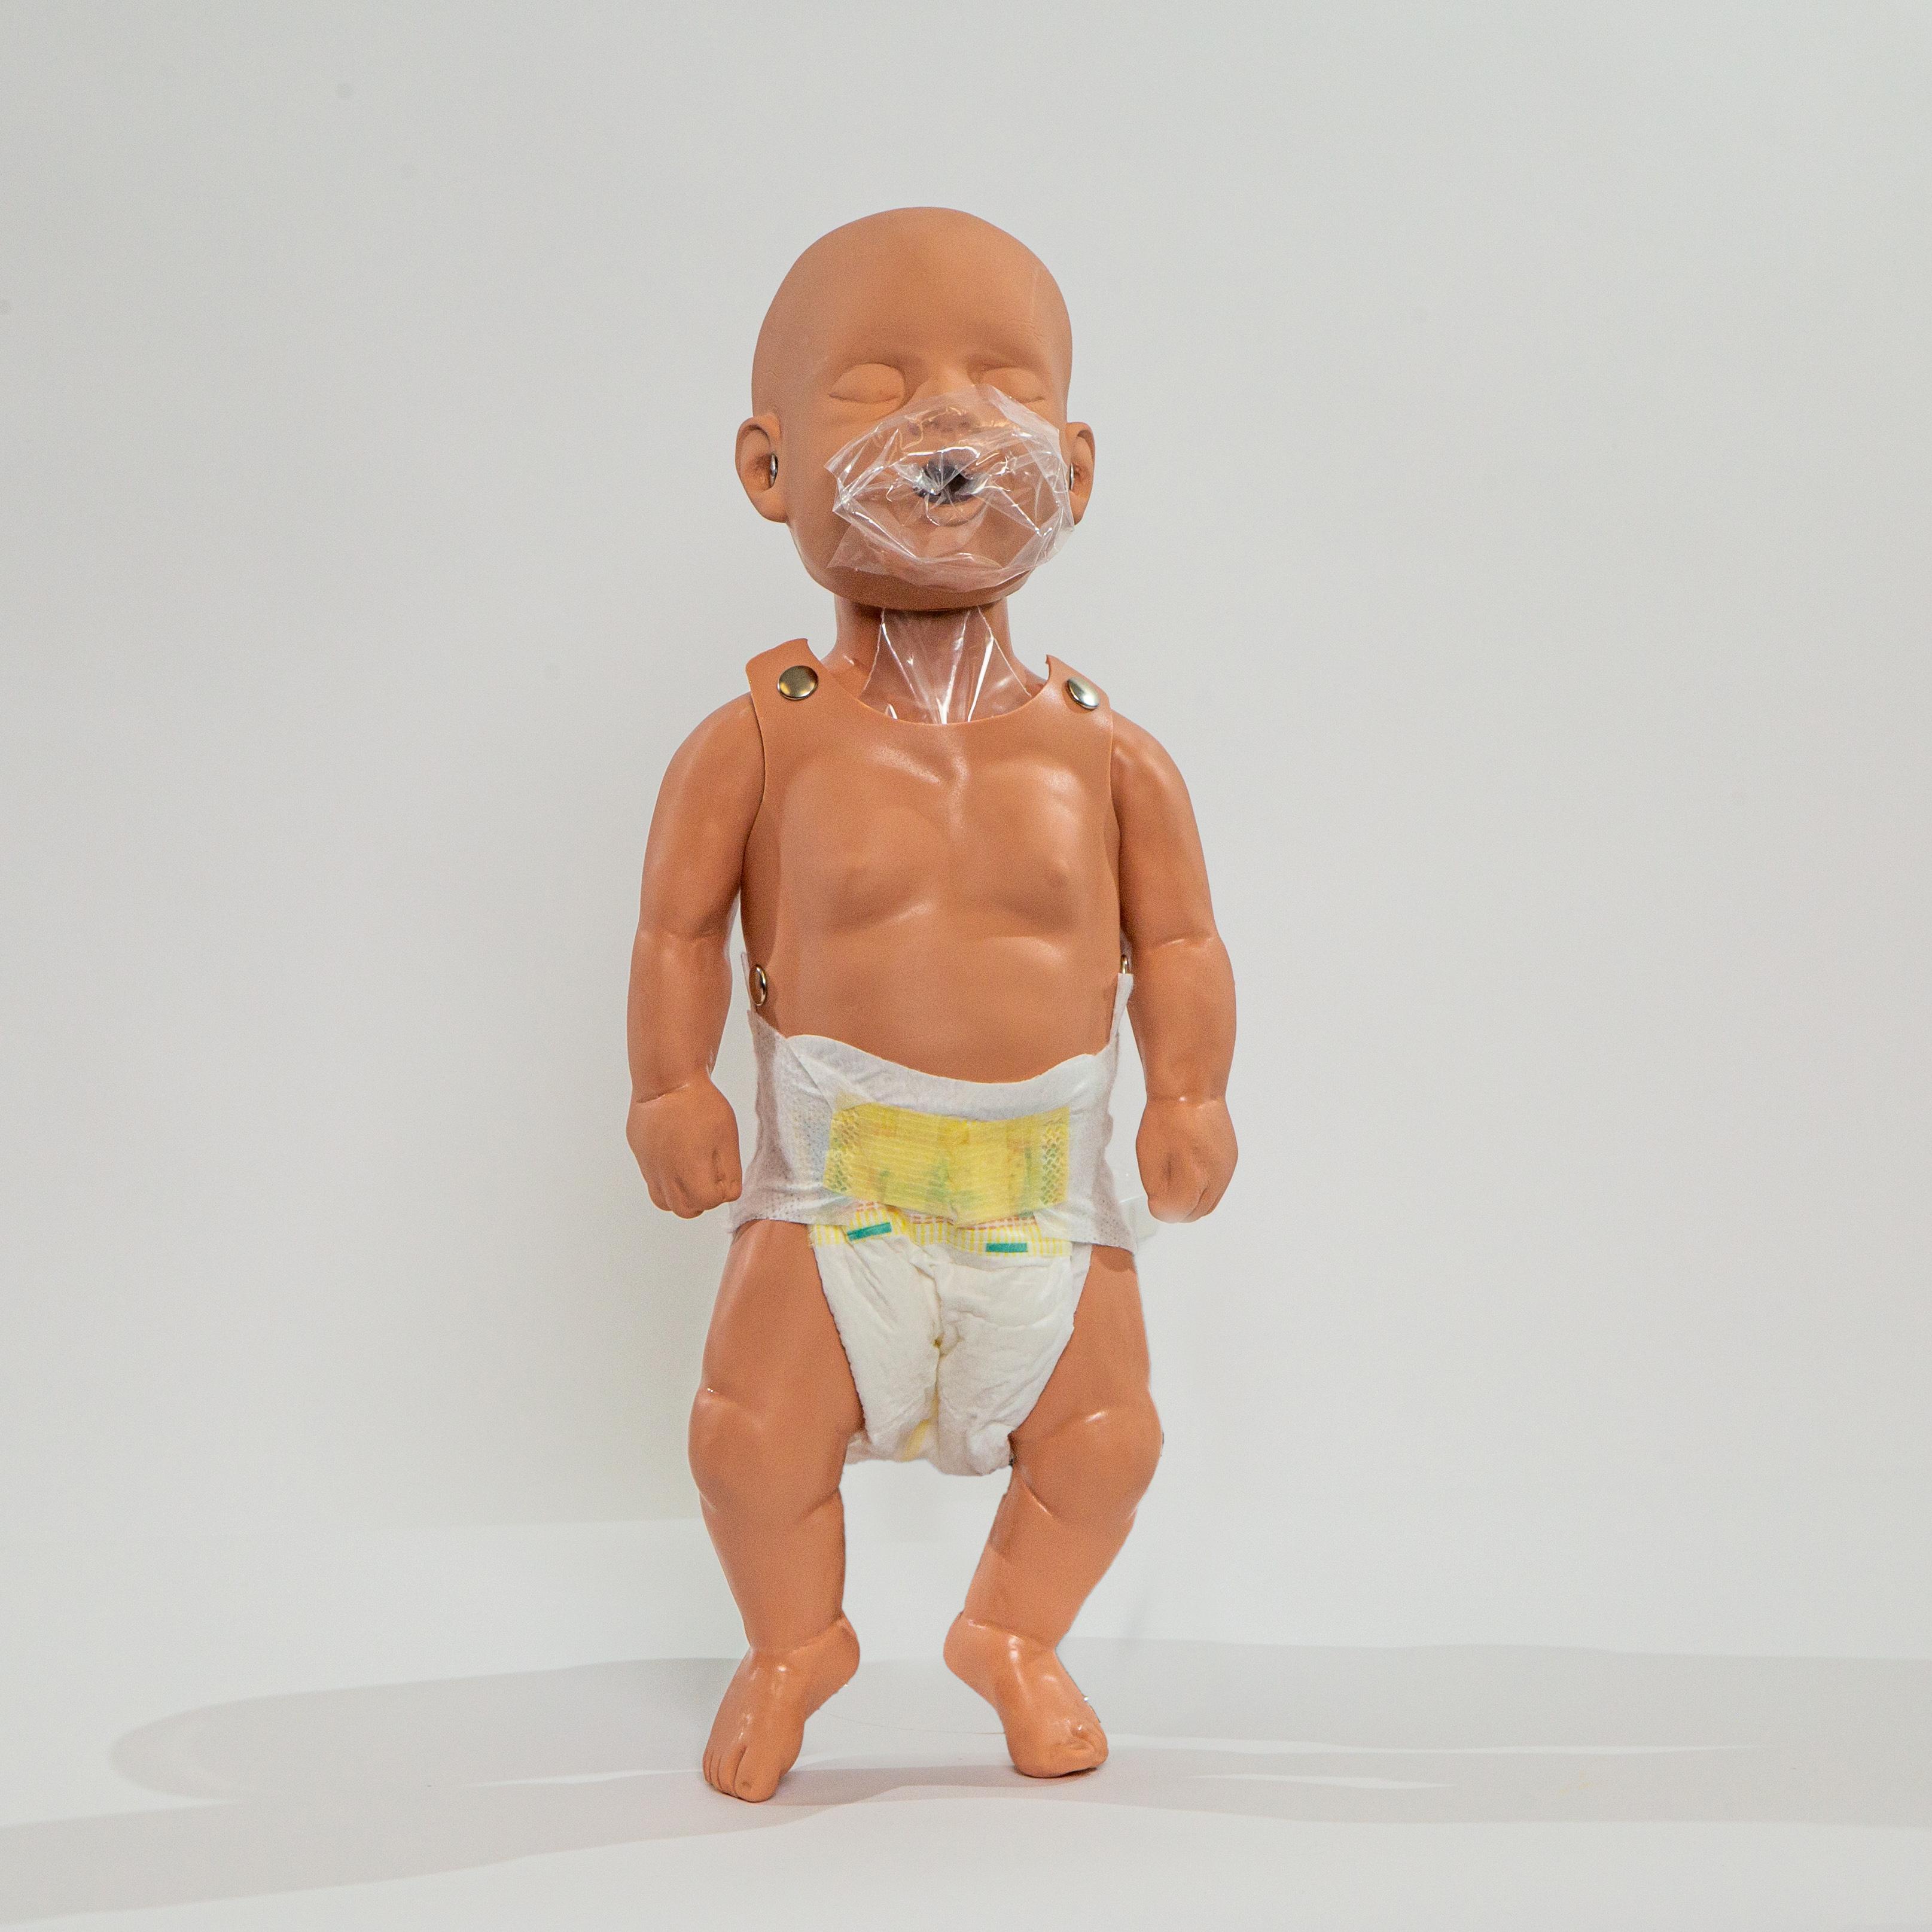 Simulaids Sani-Baby CPR Infant Manikin